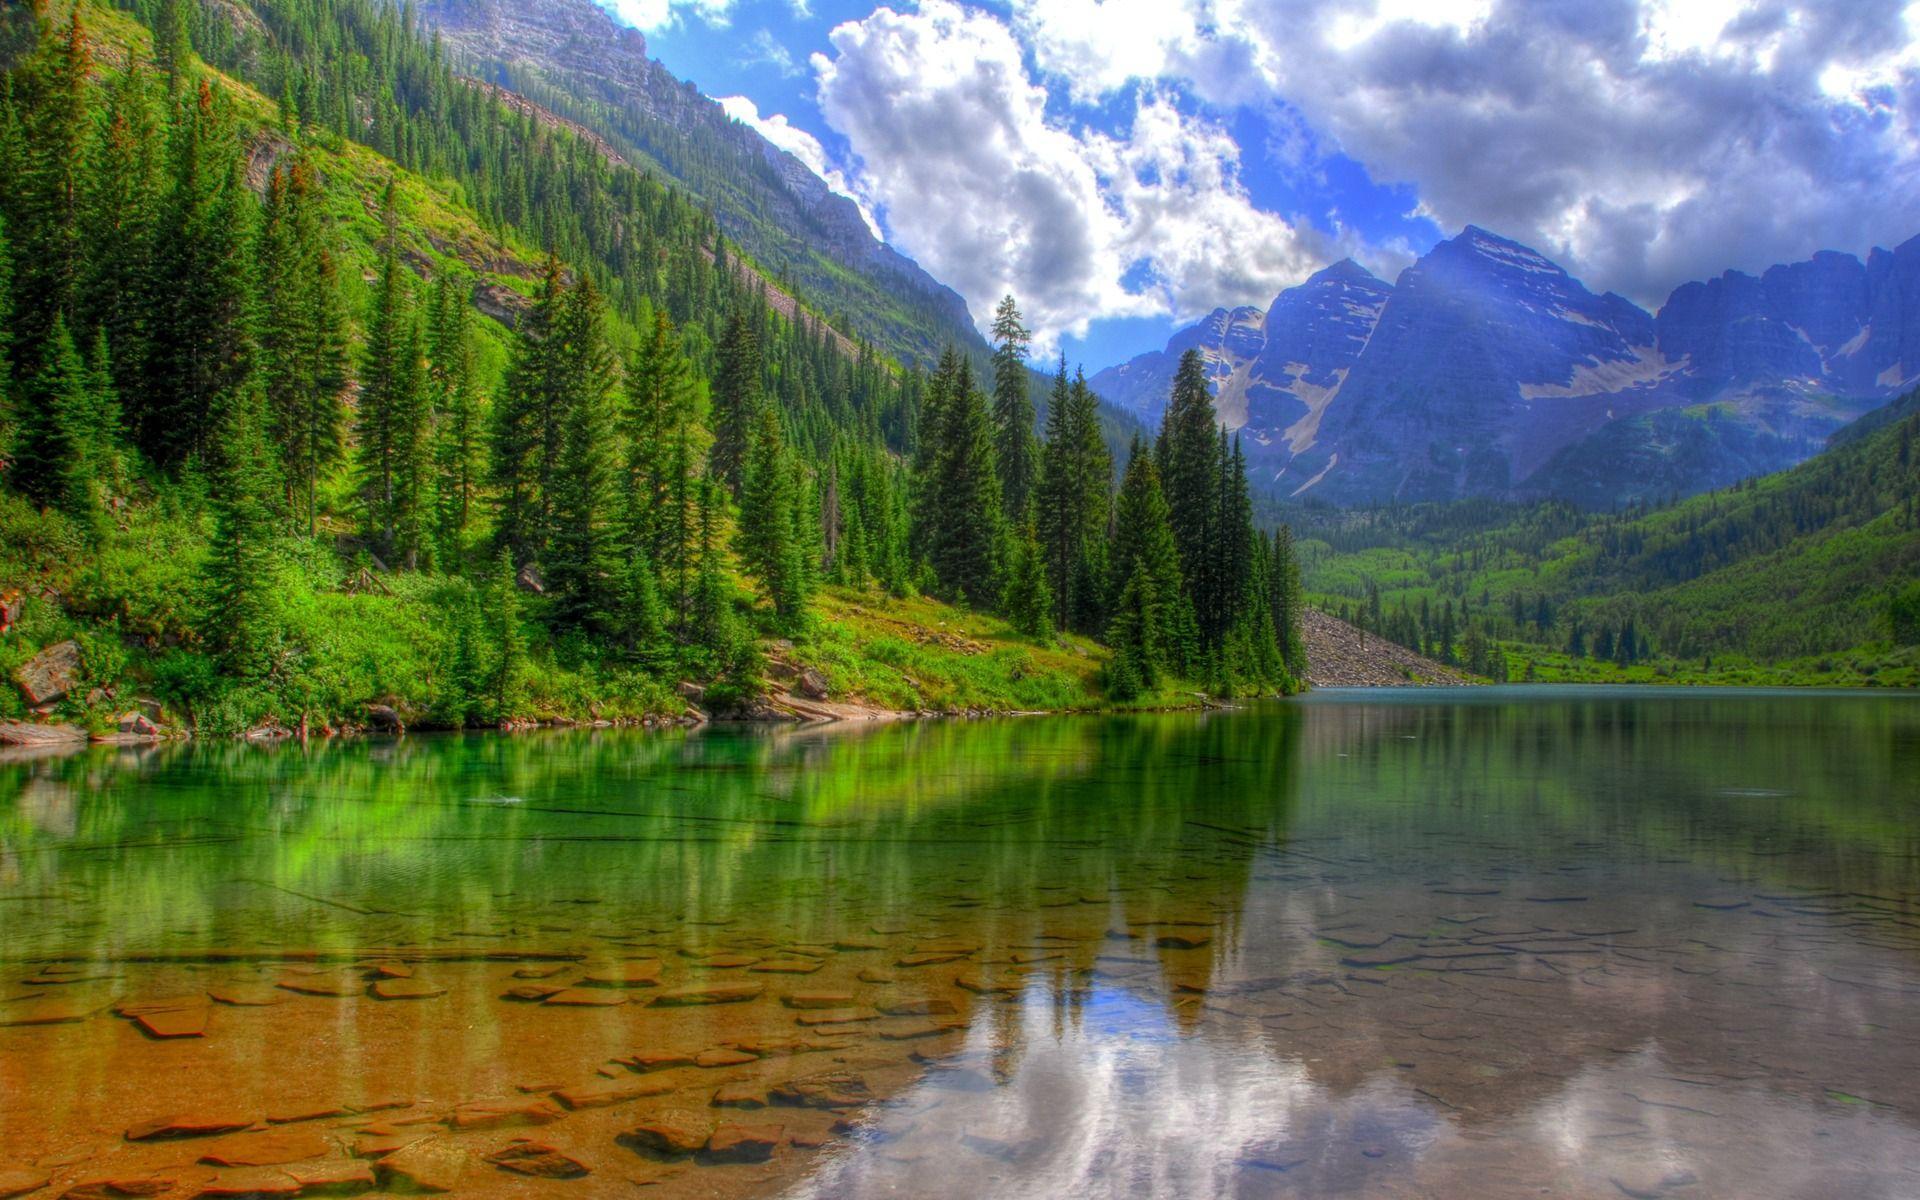 Nature Landscape Wallpapers Top Free Nature Landscape Backgrounds Wallpaperaccess